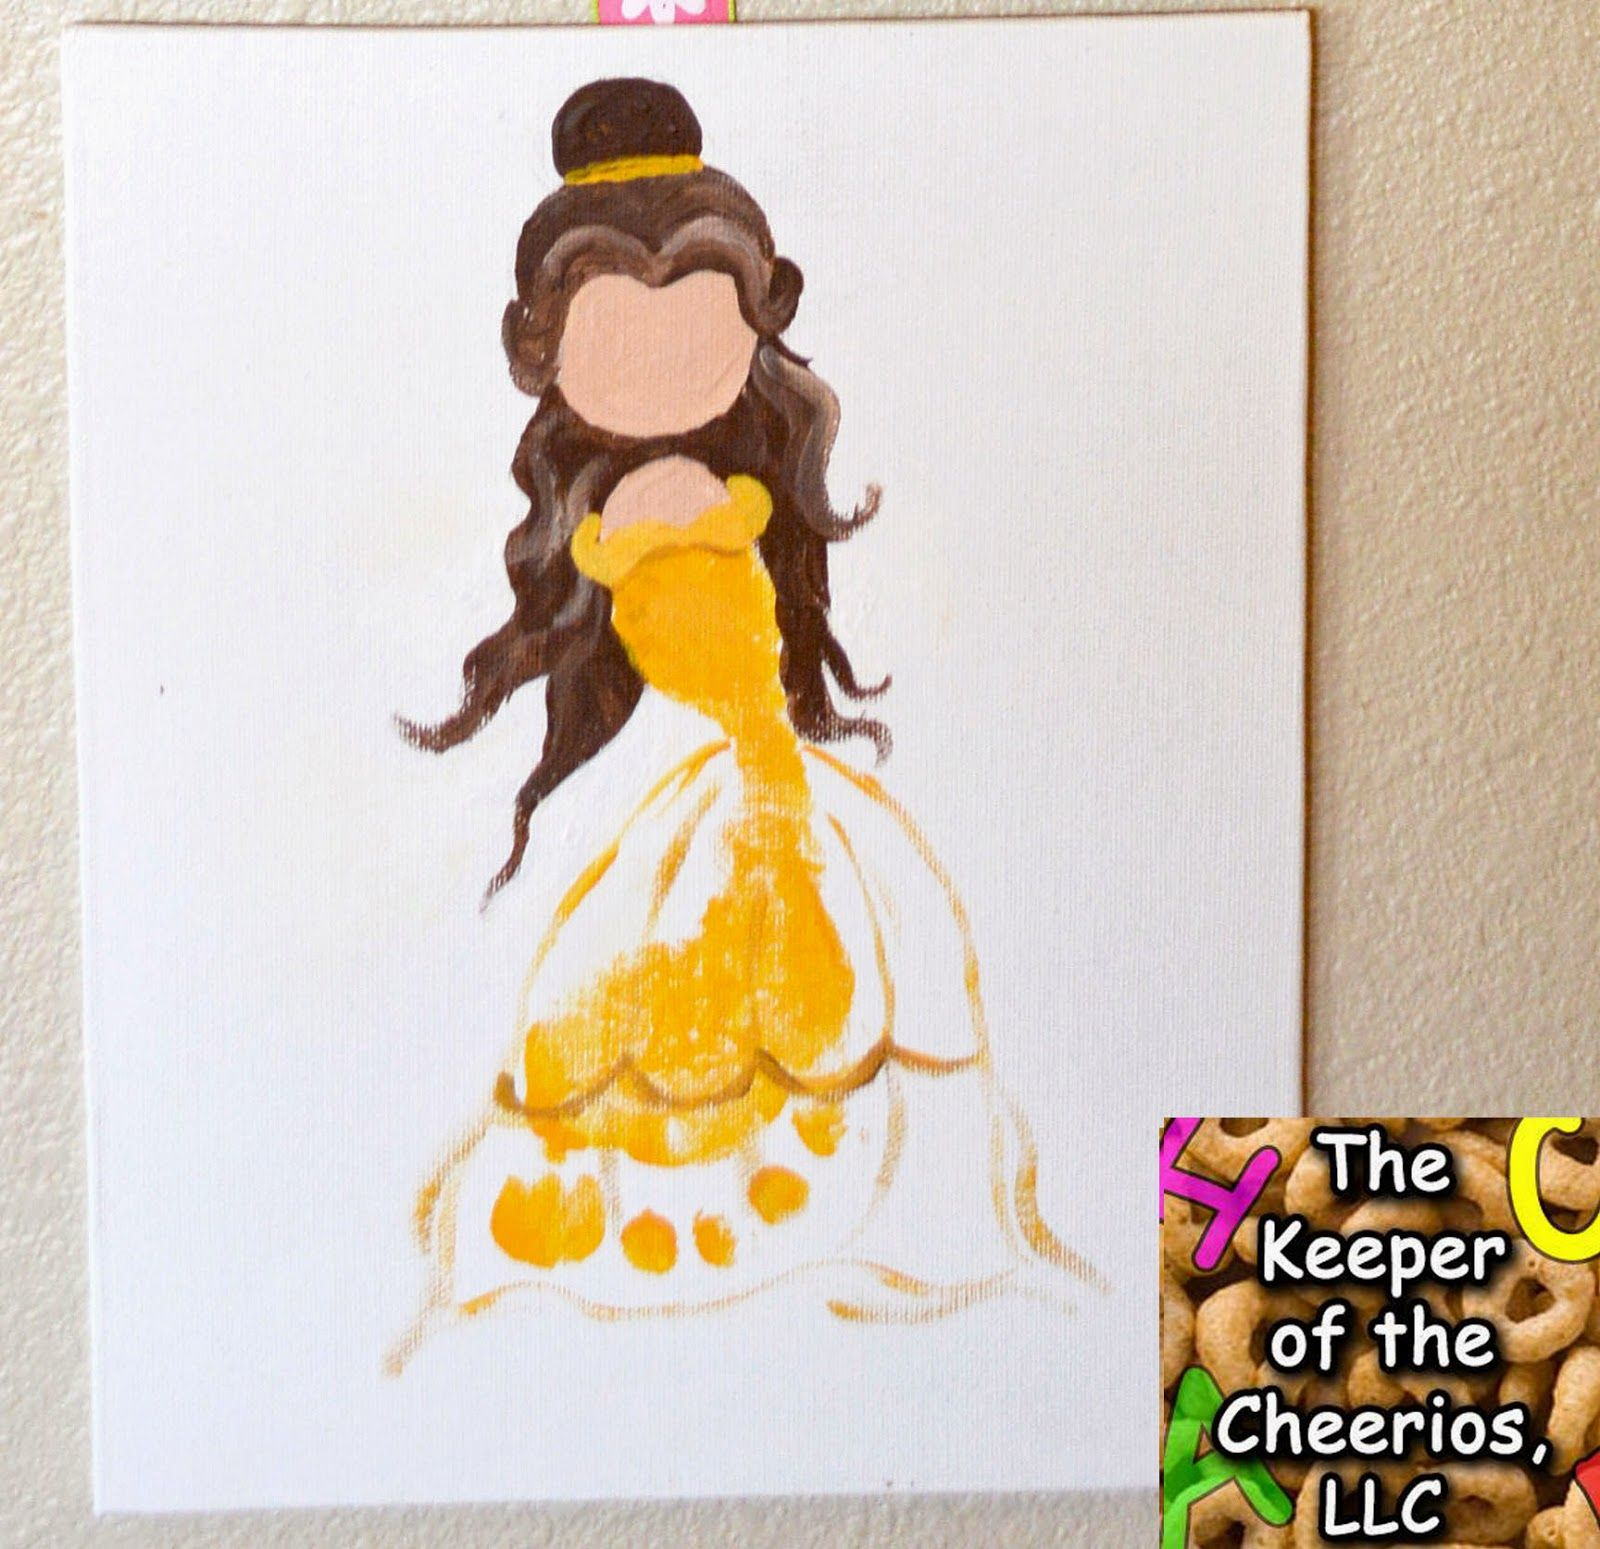 The Keeper of the Cheerios: Princess Footprints 2